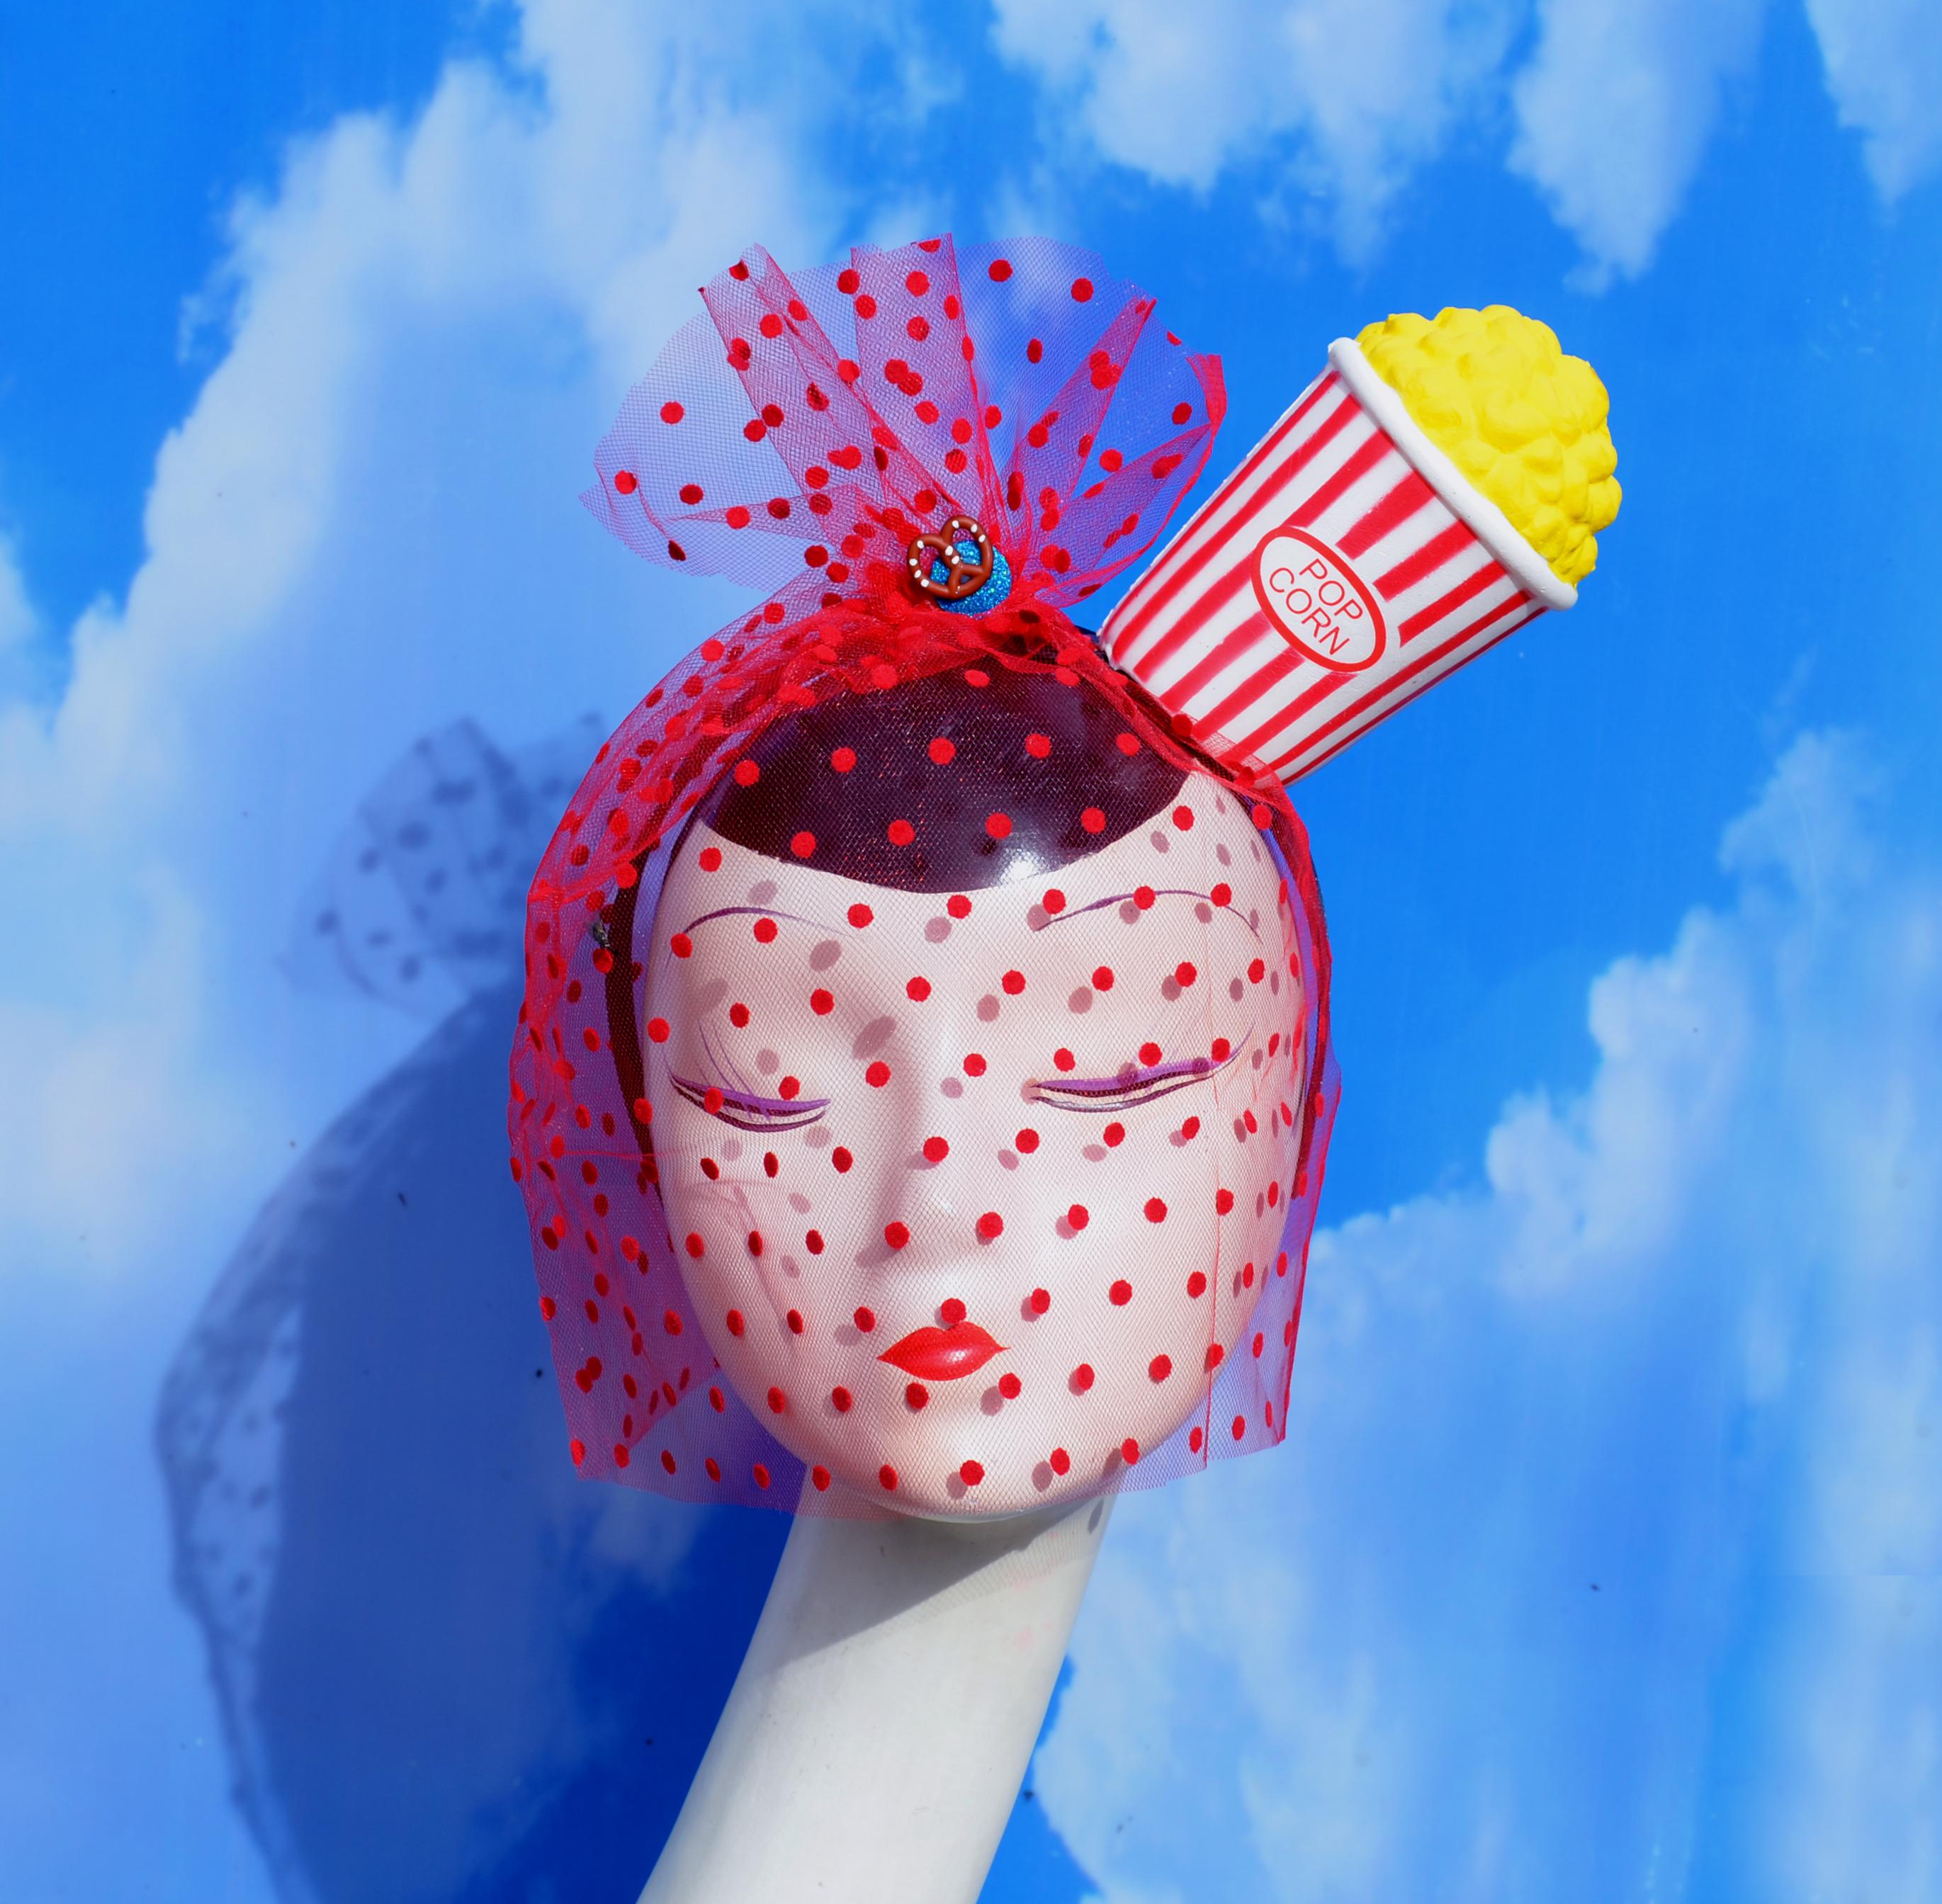 Bucket of Popcorn Costume Headpiece with